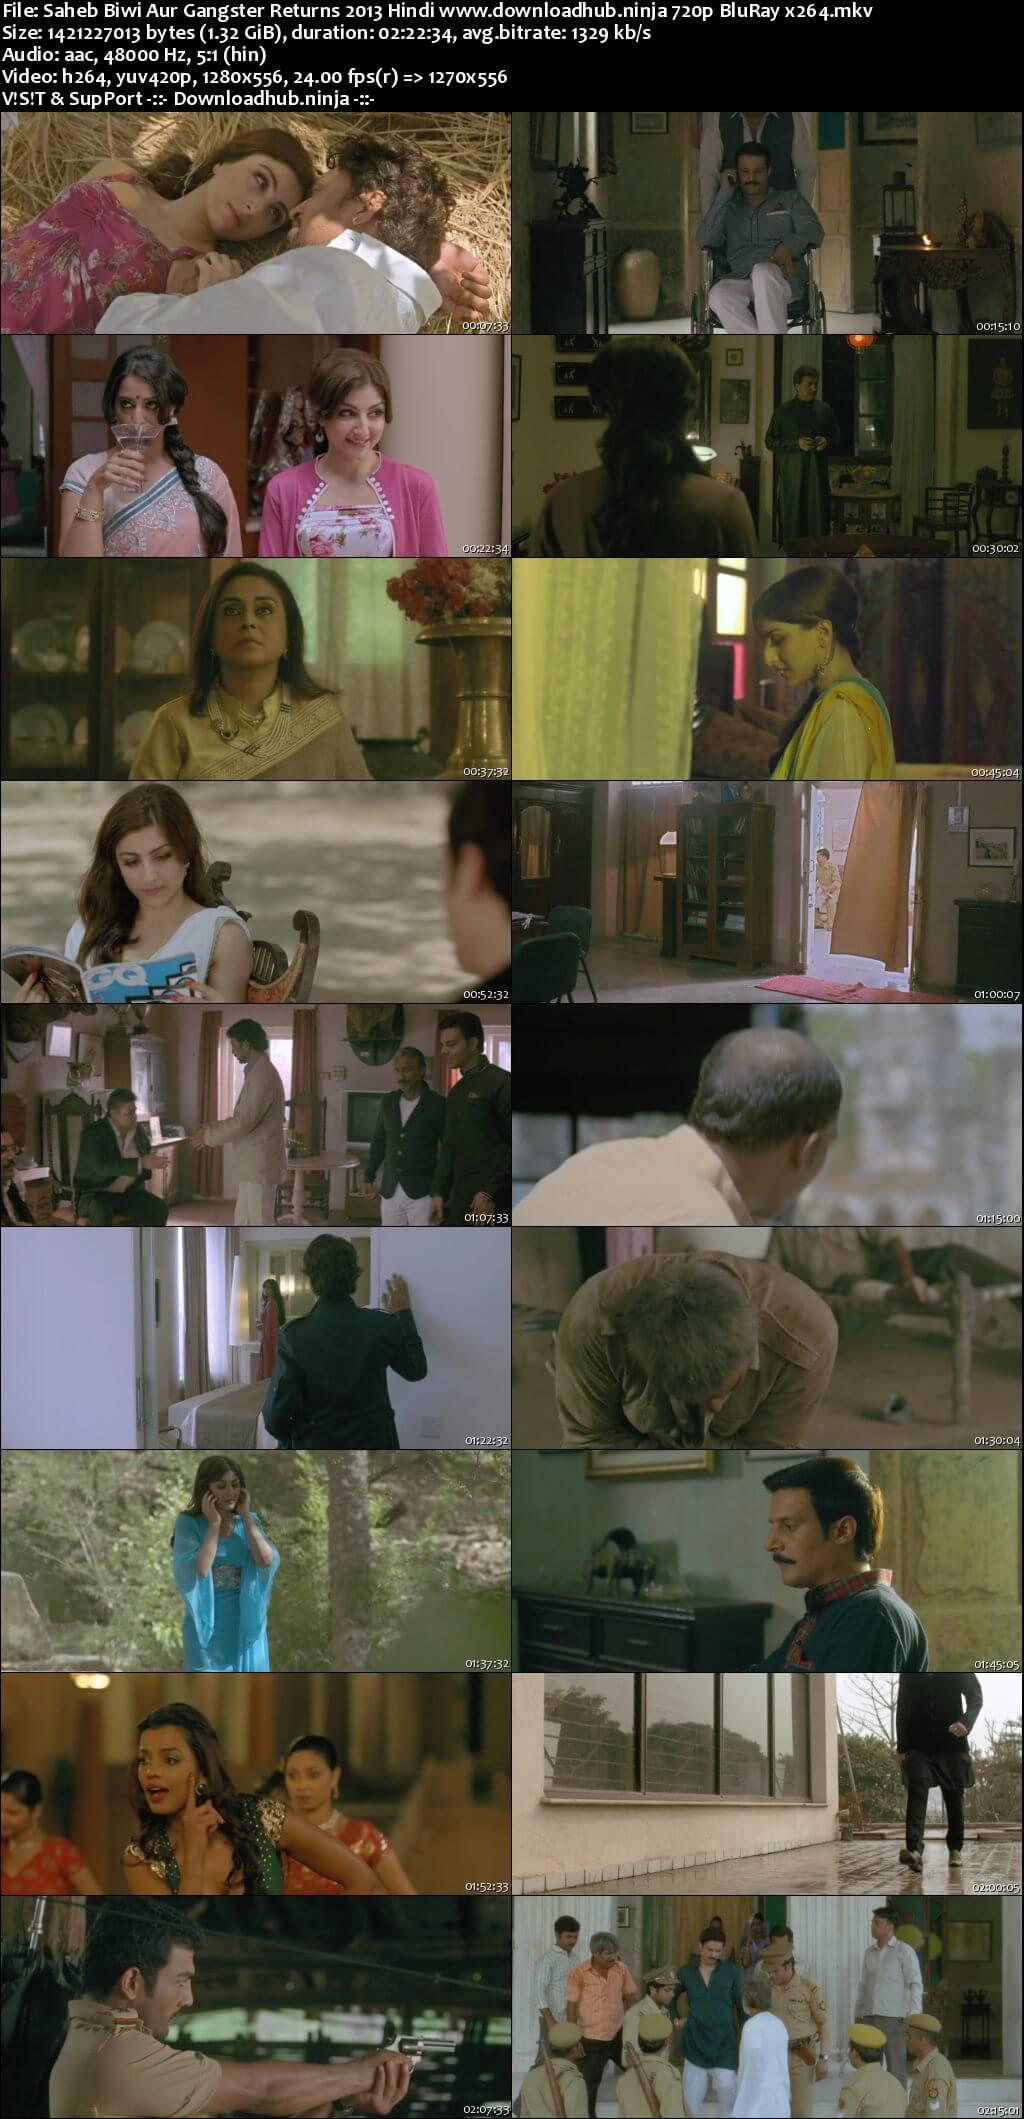 Saheb Biwi Aur Gangster Returns 2013 Hindi 720p BluRay x264